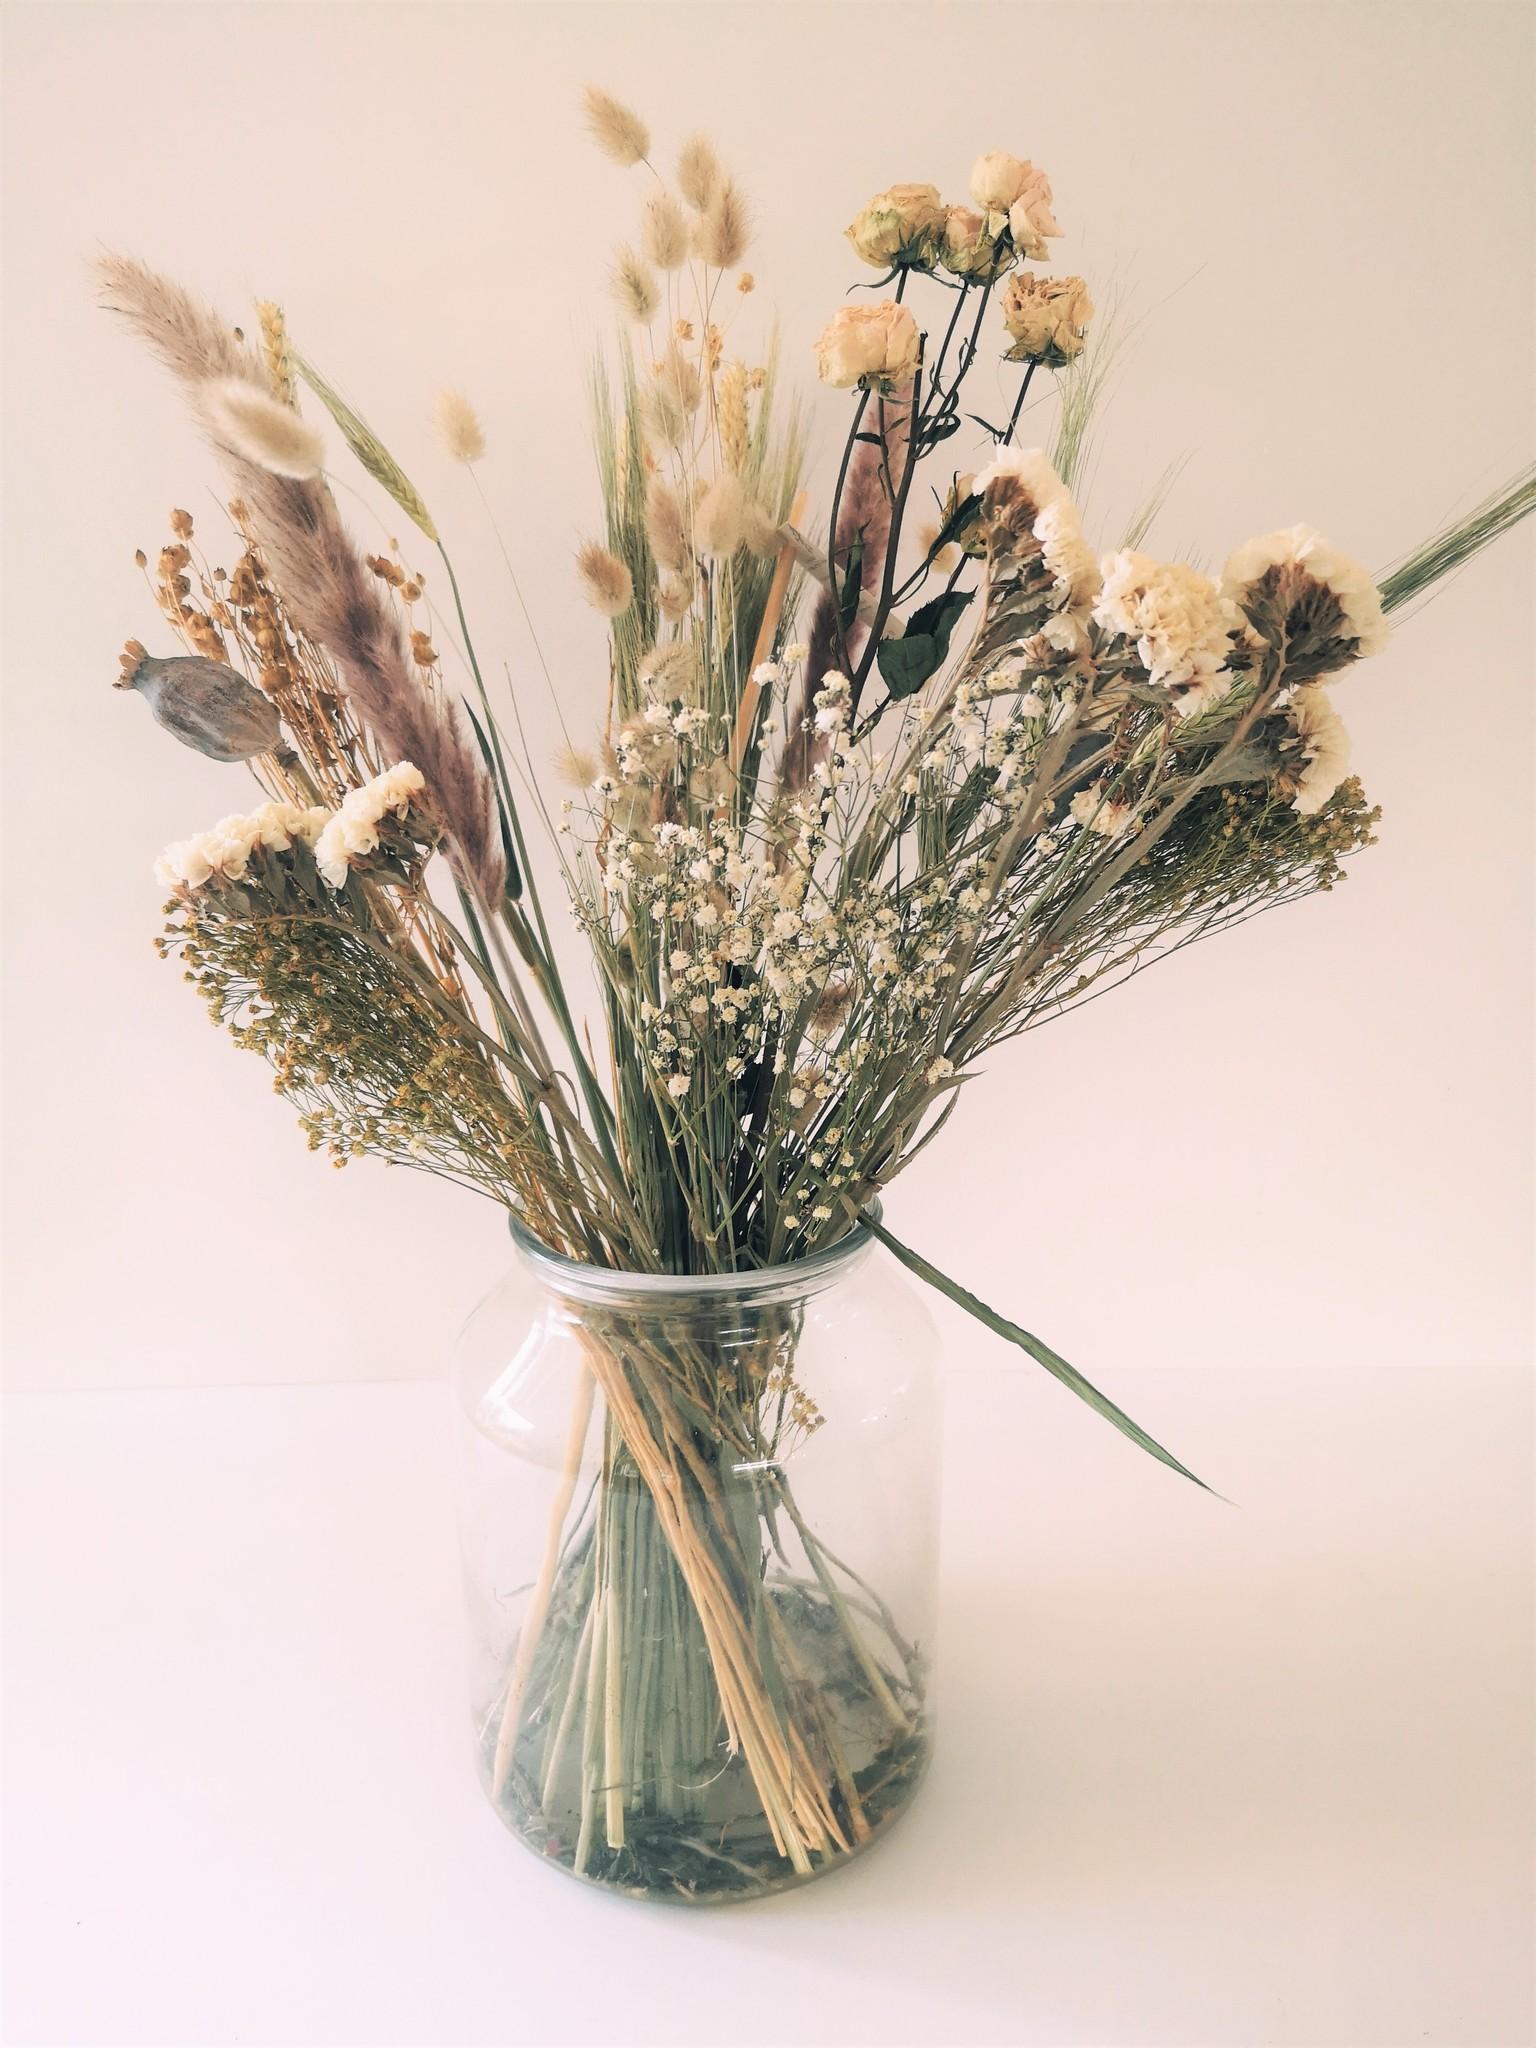 Wildflowers BLANCHE - Medium-1